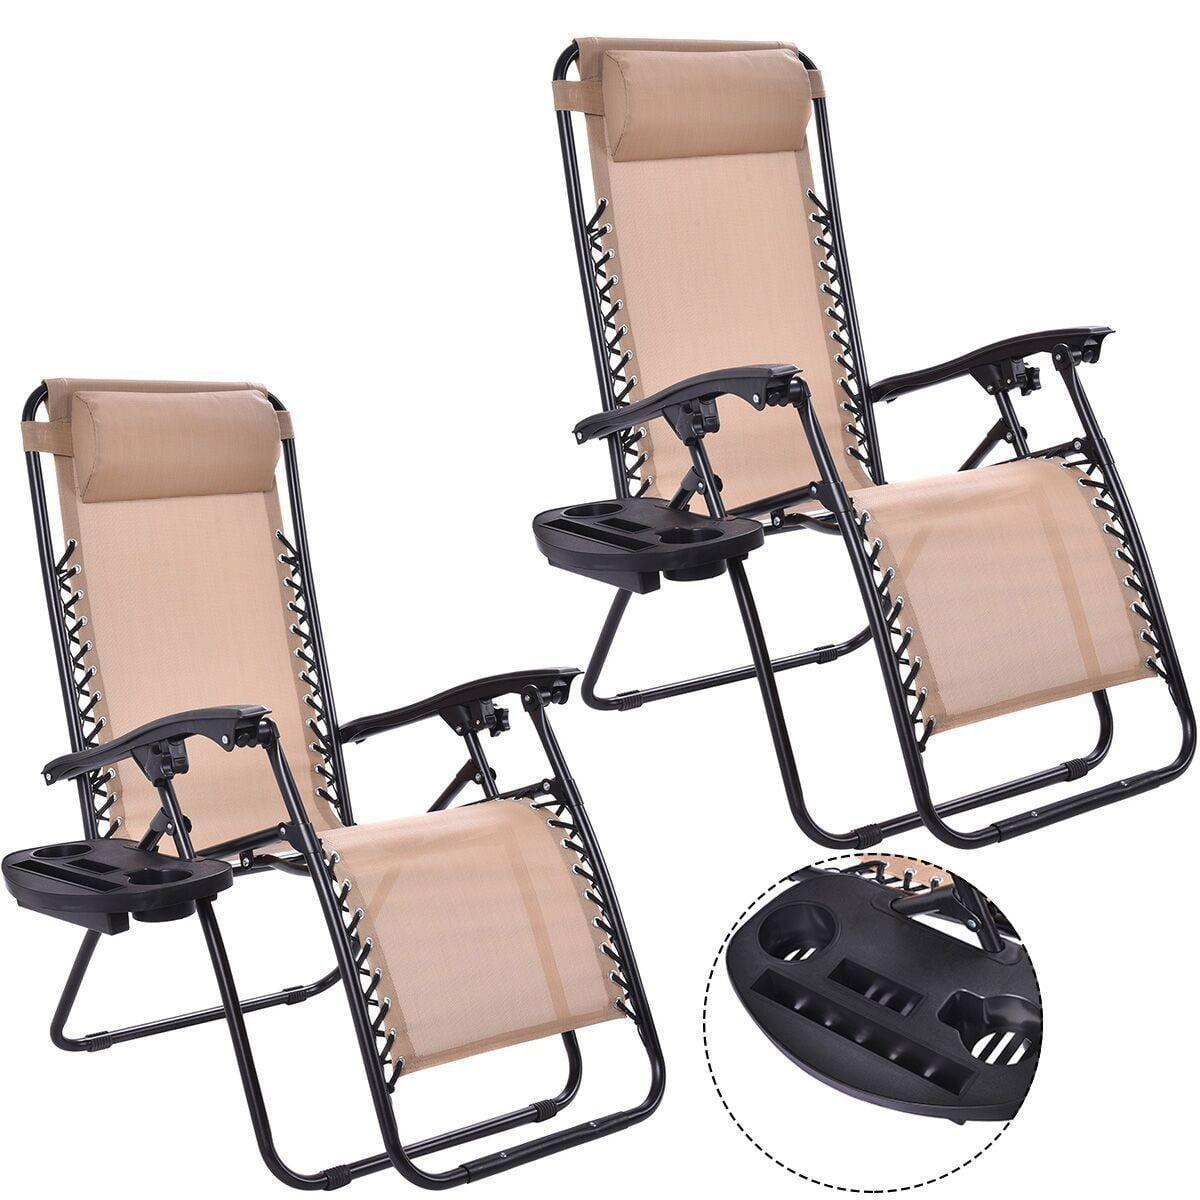 Zero Gravity Reclining Lounge Chair, Set of 2 (Beige)